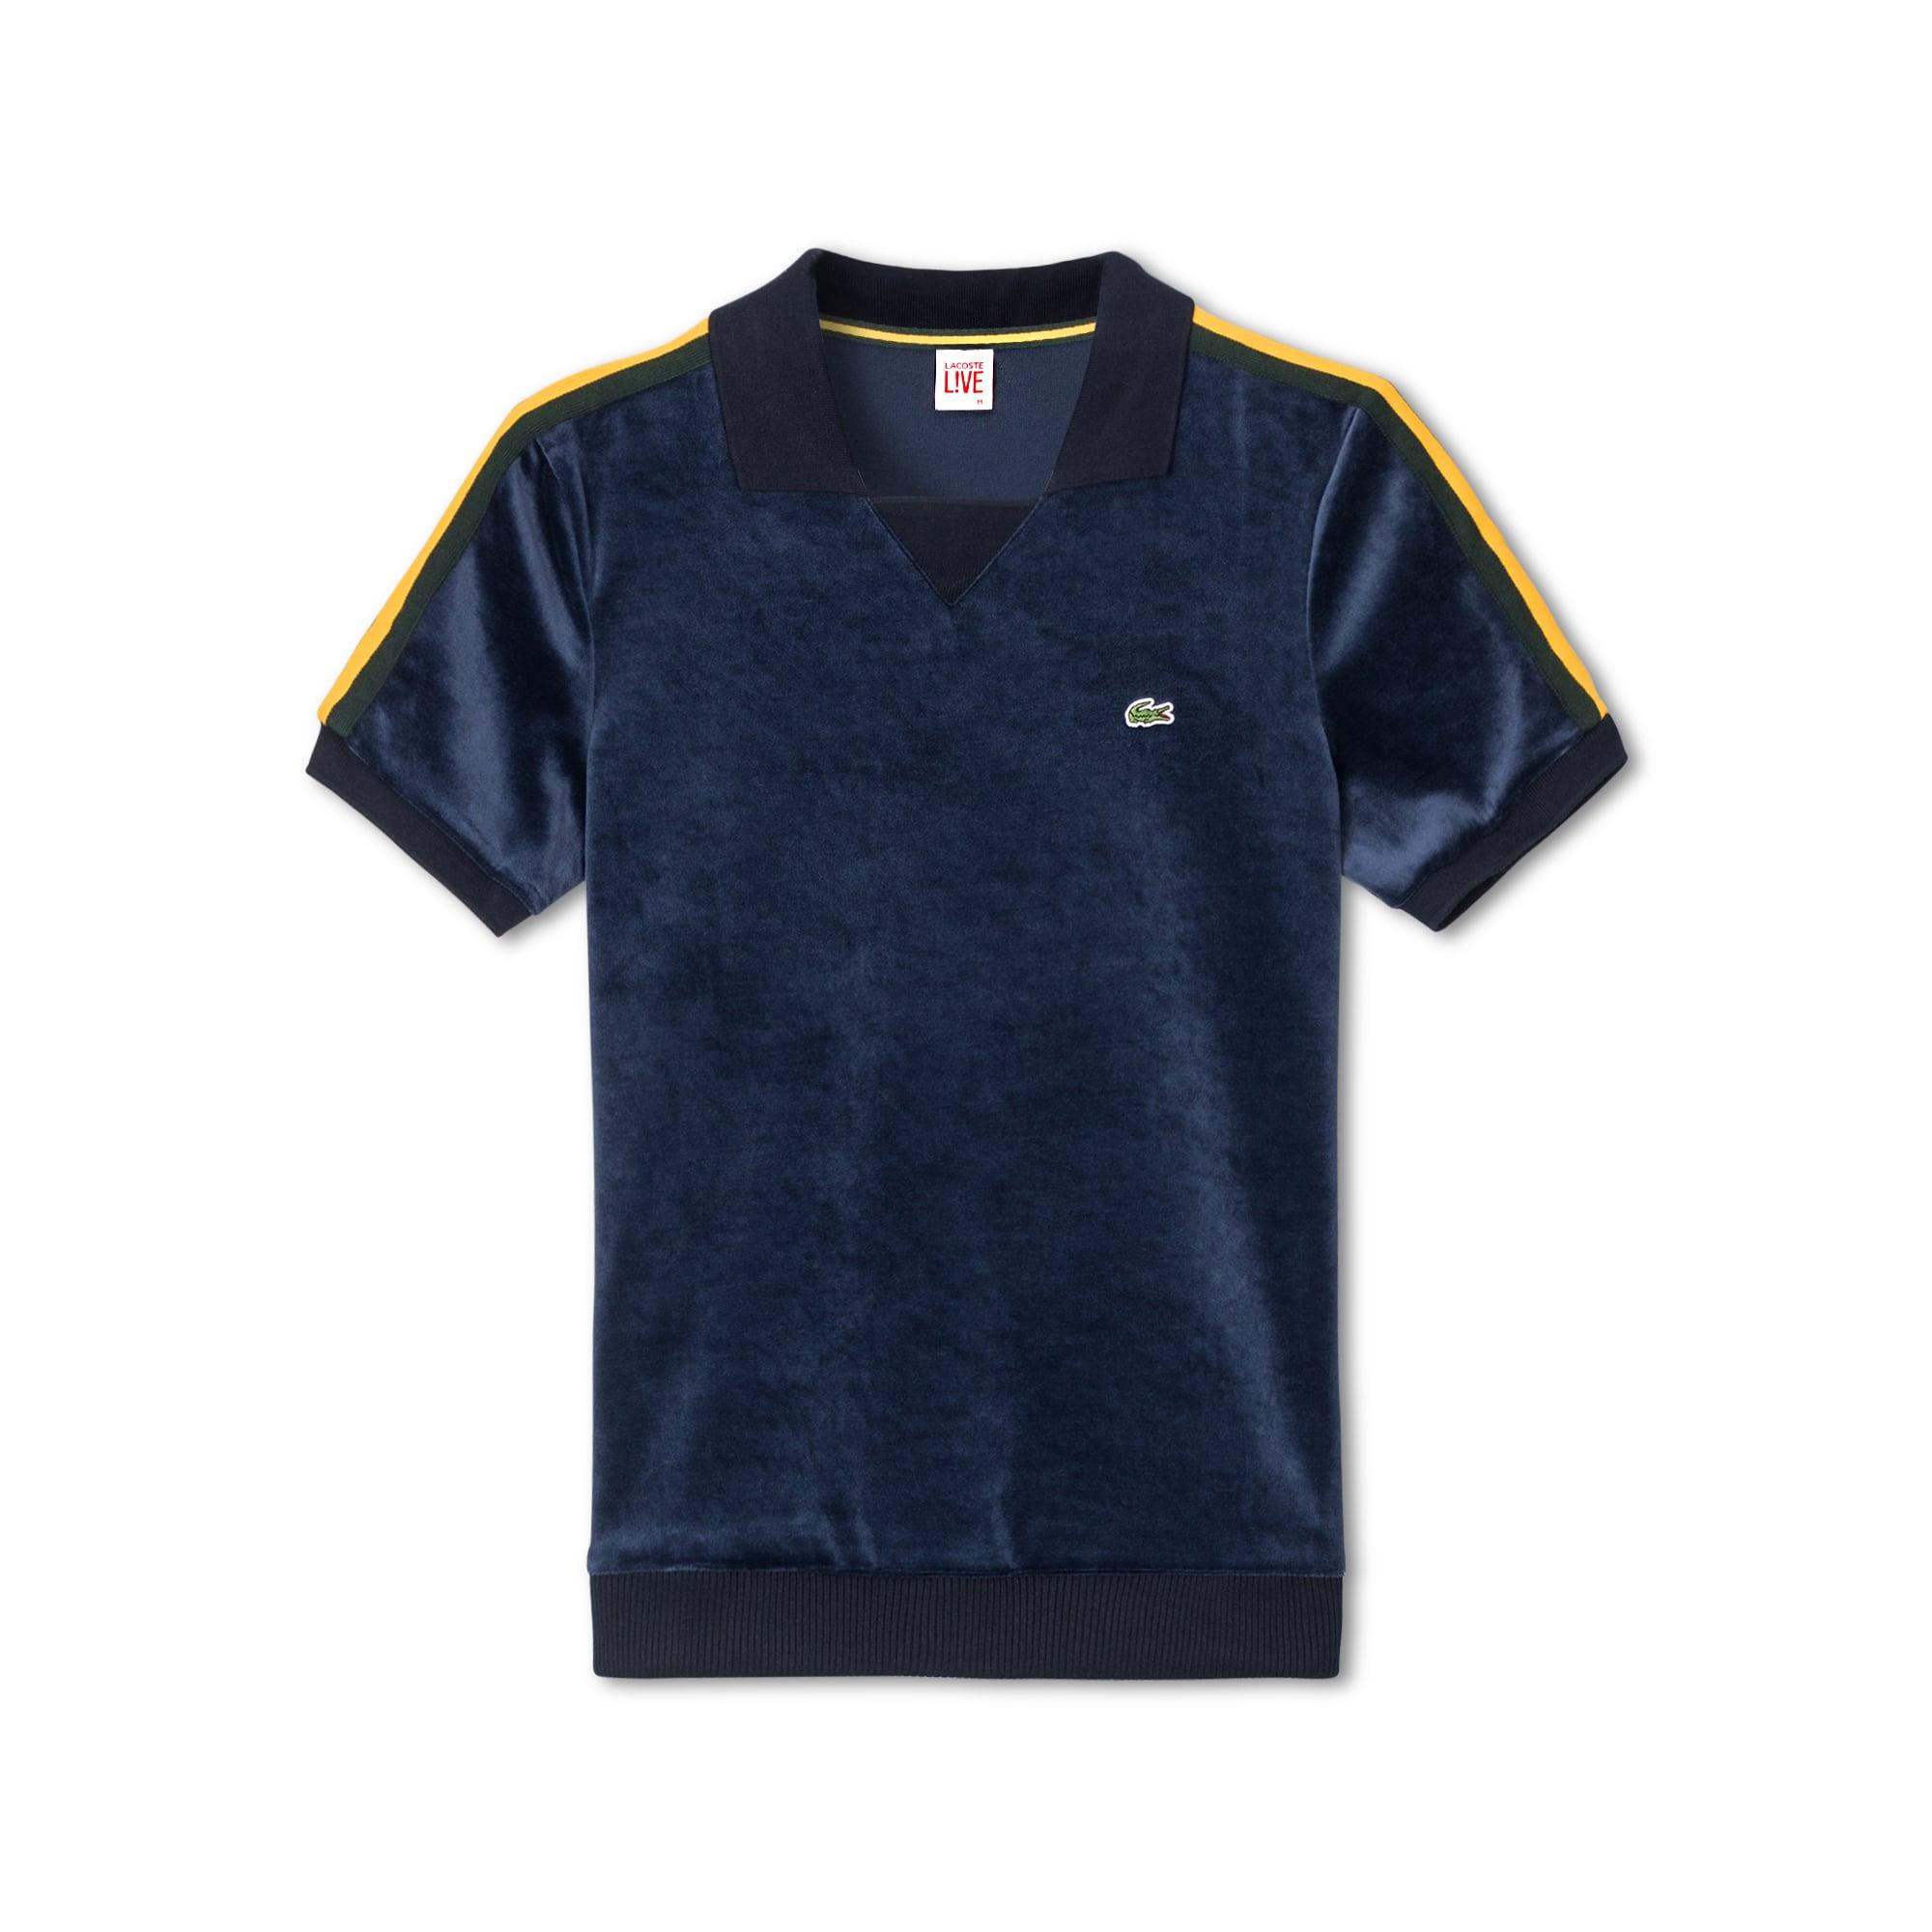 Lacoste LIVE系列宽松版撞色带女士Polo衫